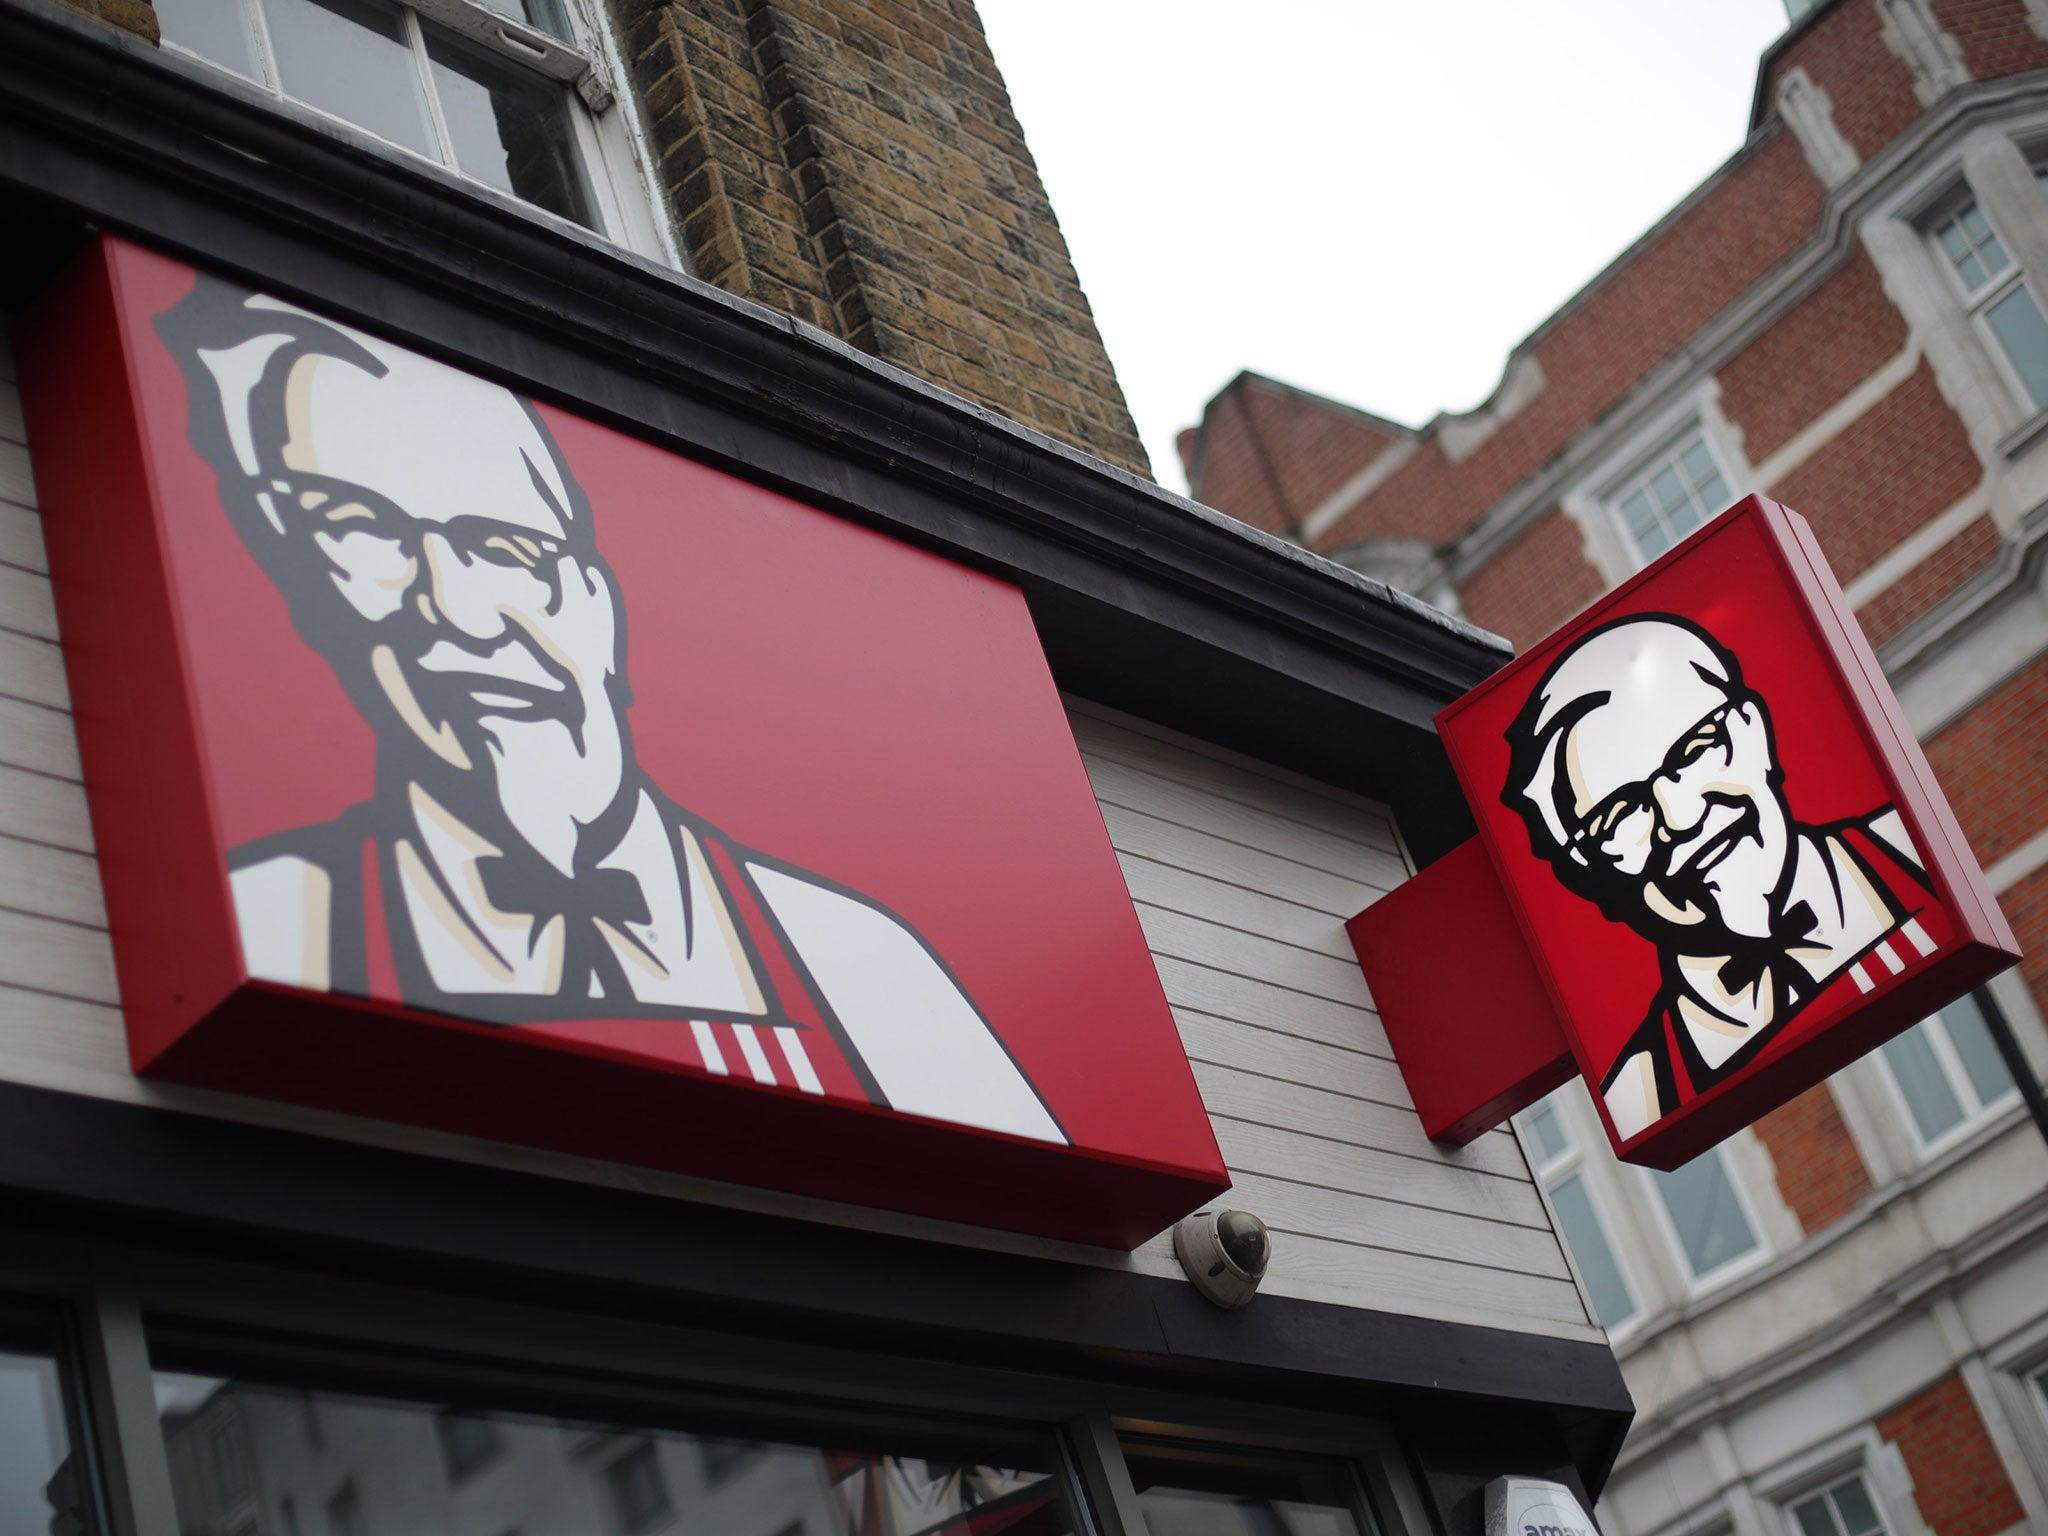 KFC, Pizza Hut and Starbucks criticised over animal welfare standards in new report